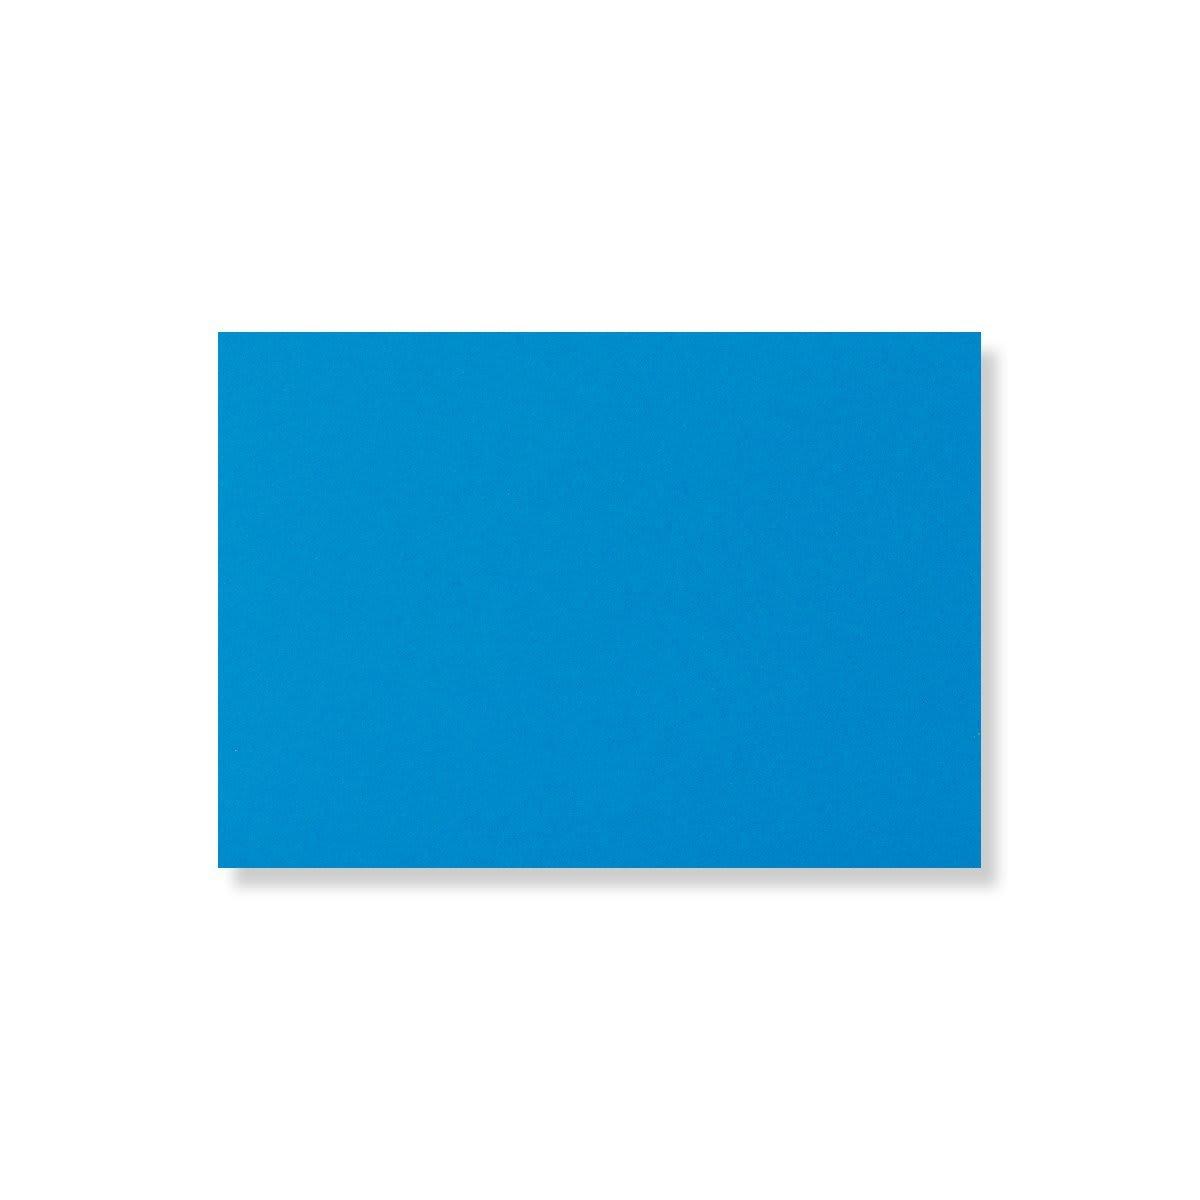 C7 BRIGHT BLUE ENVELOPES 120GSM